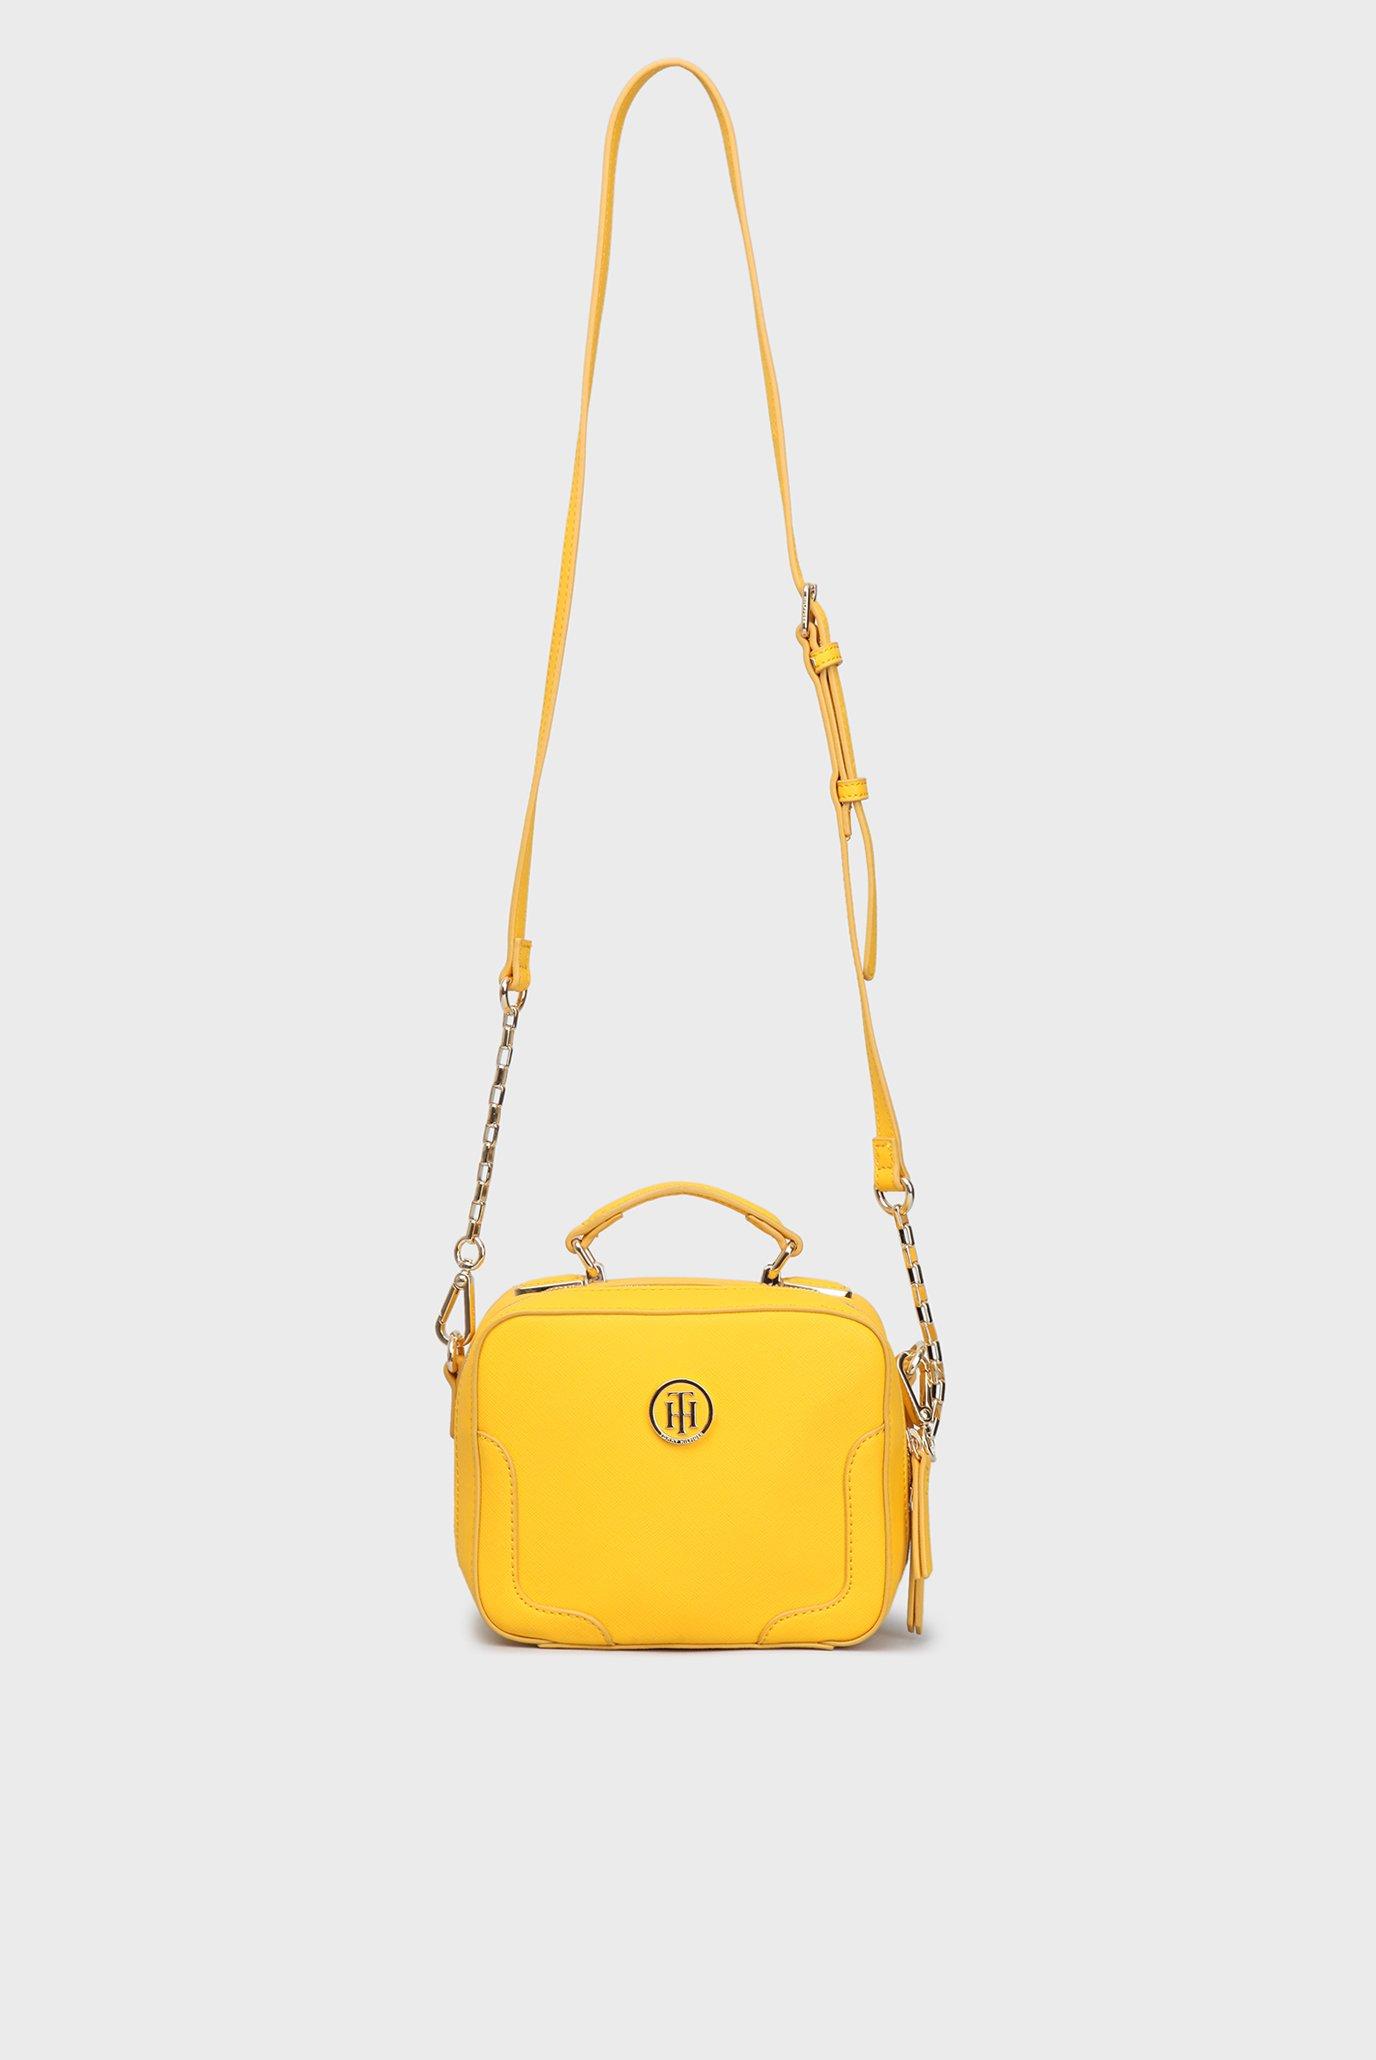 e38dd07ab55 Купить Женская желтая сумка через плечо Tommy Hilfiger Tommy ...